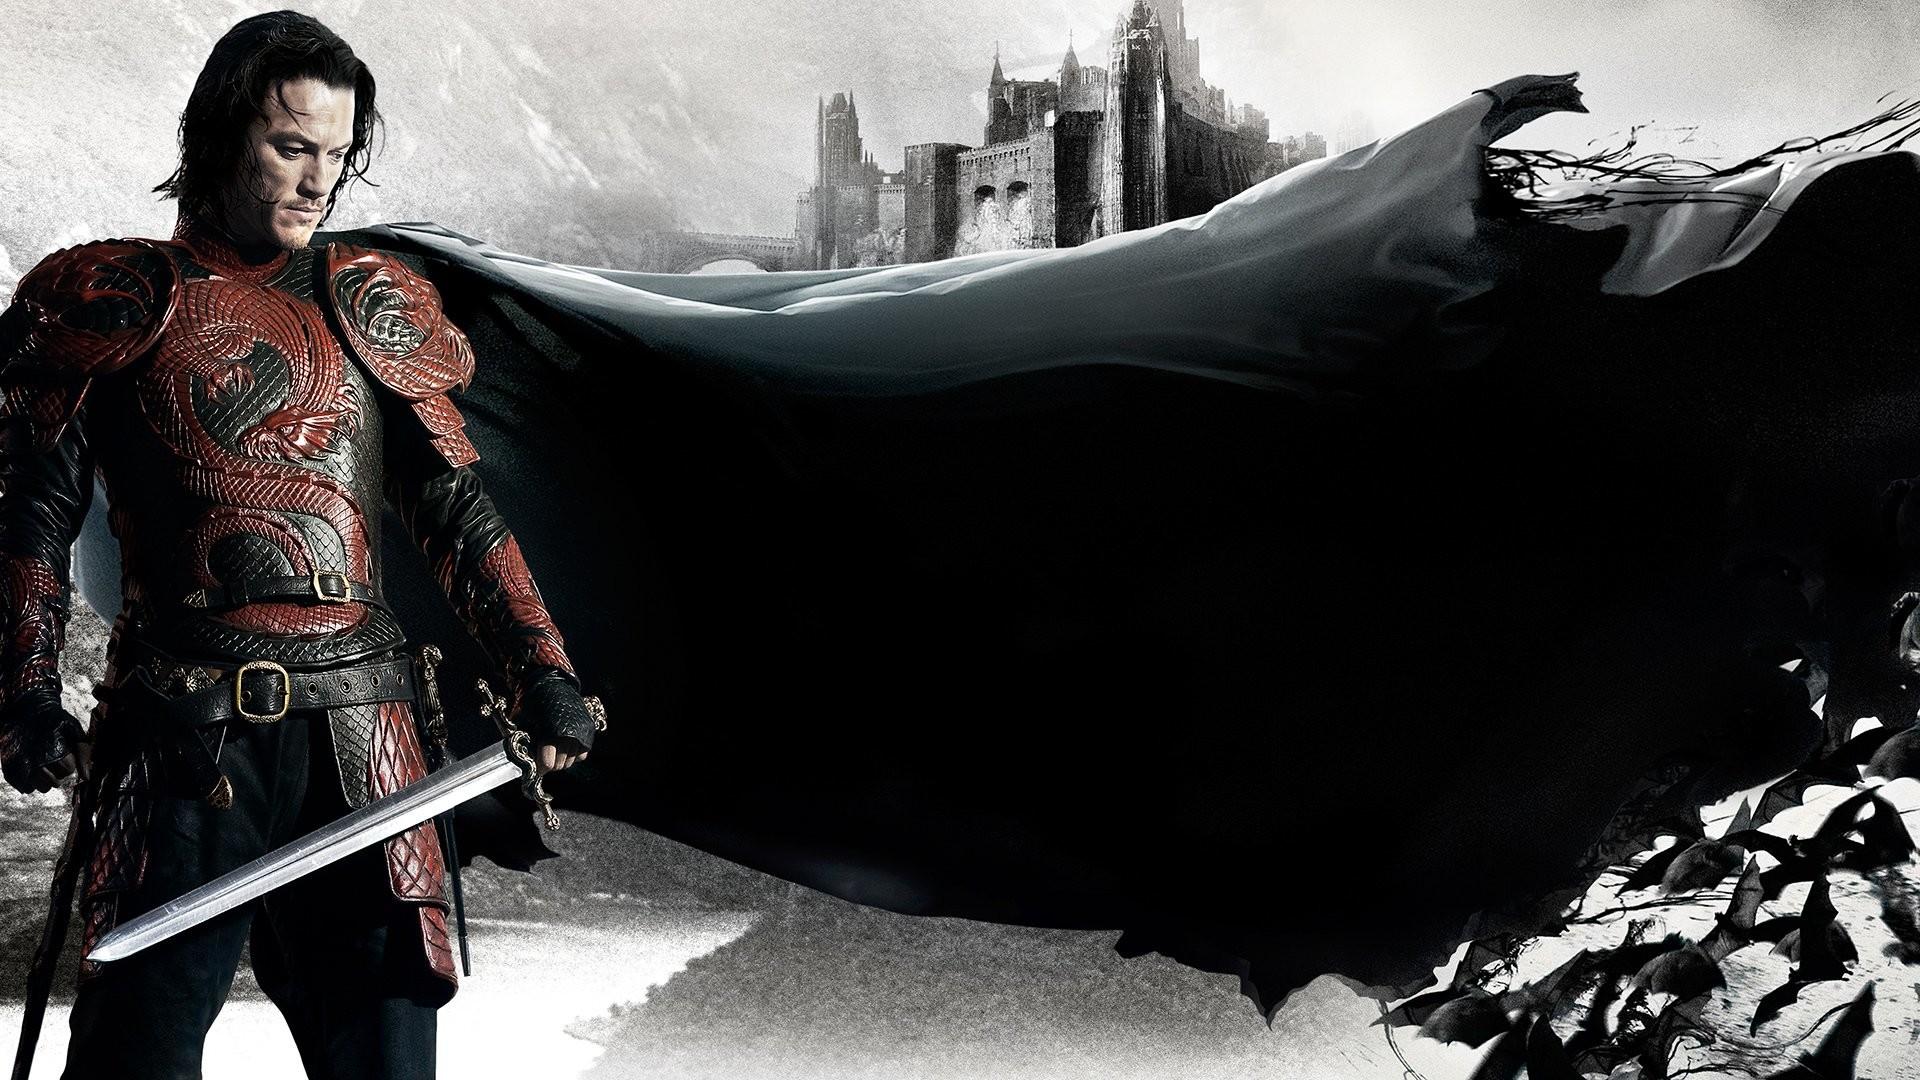 DRACULA UNTOLD drama fantasy dark vampire horror wallpaper background